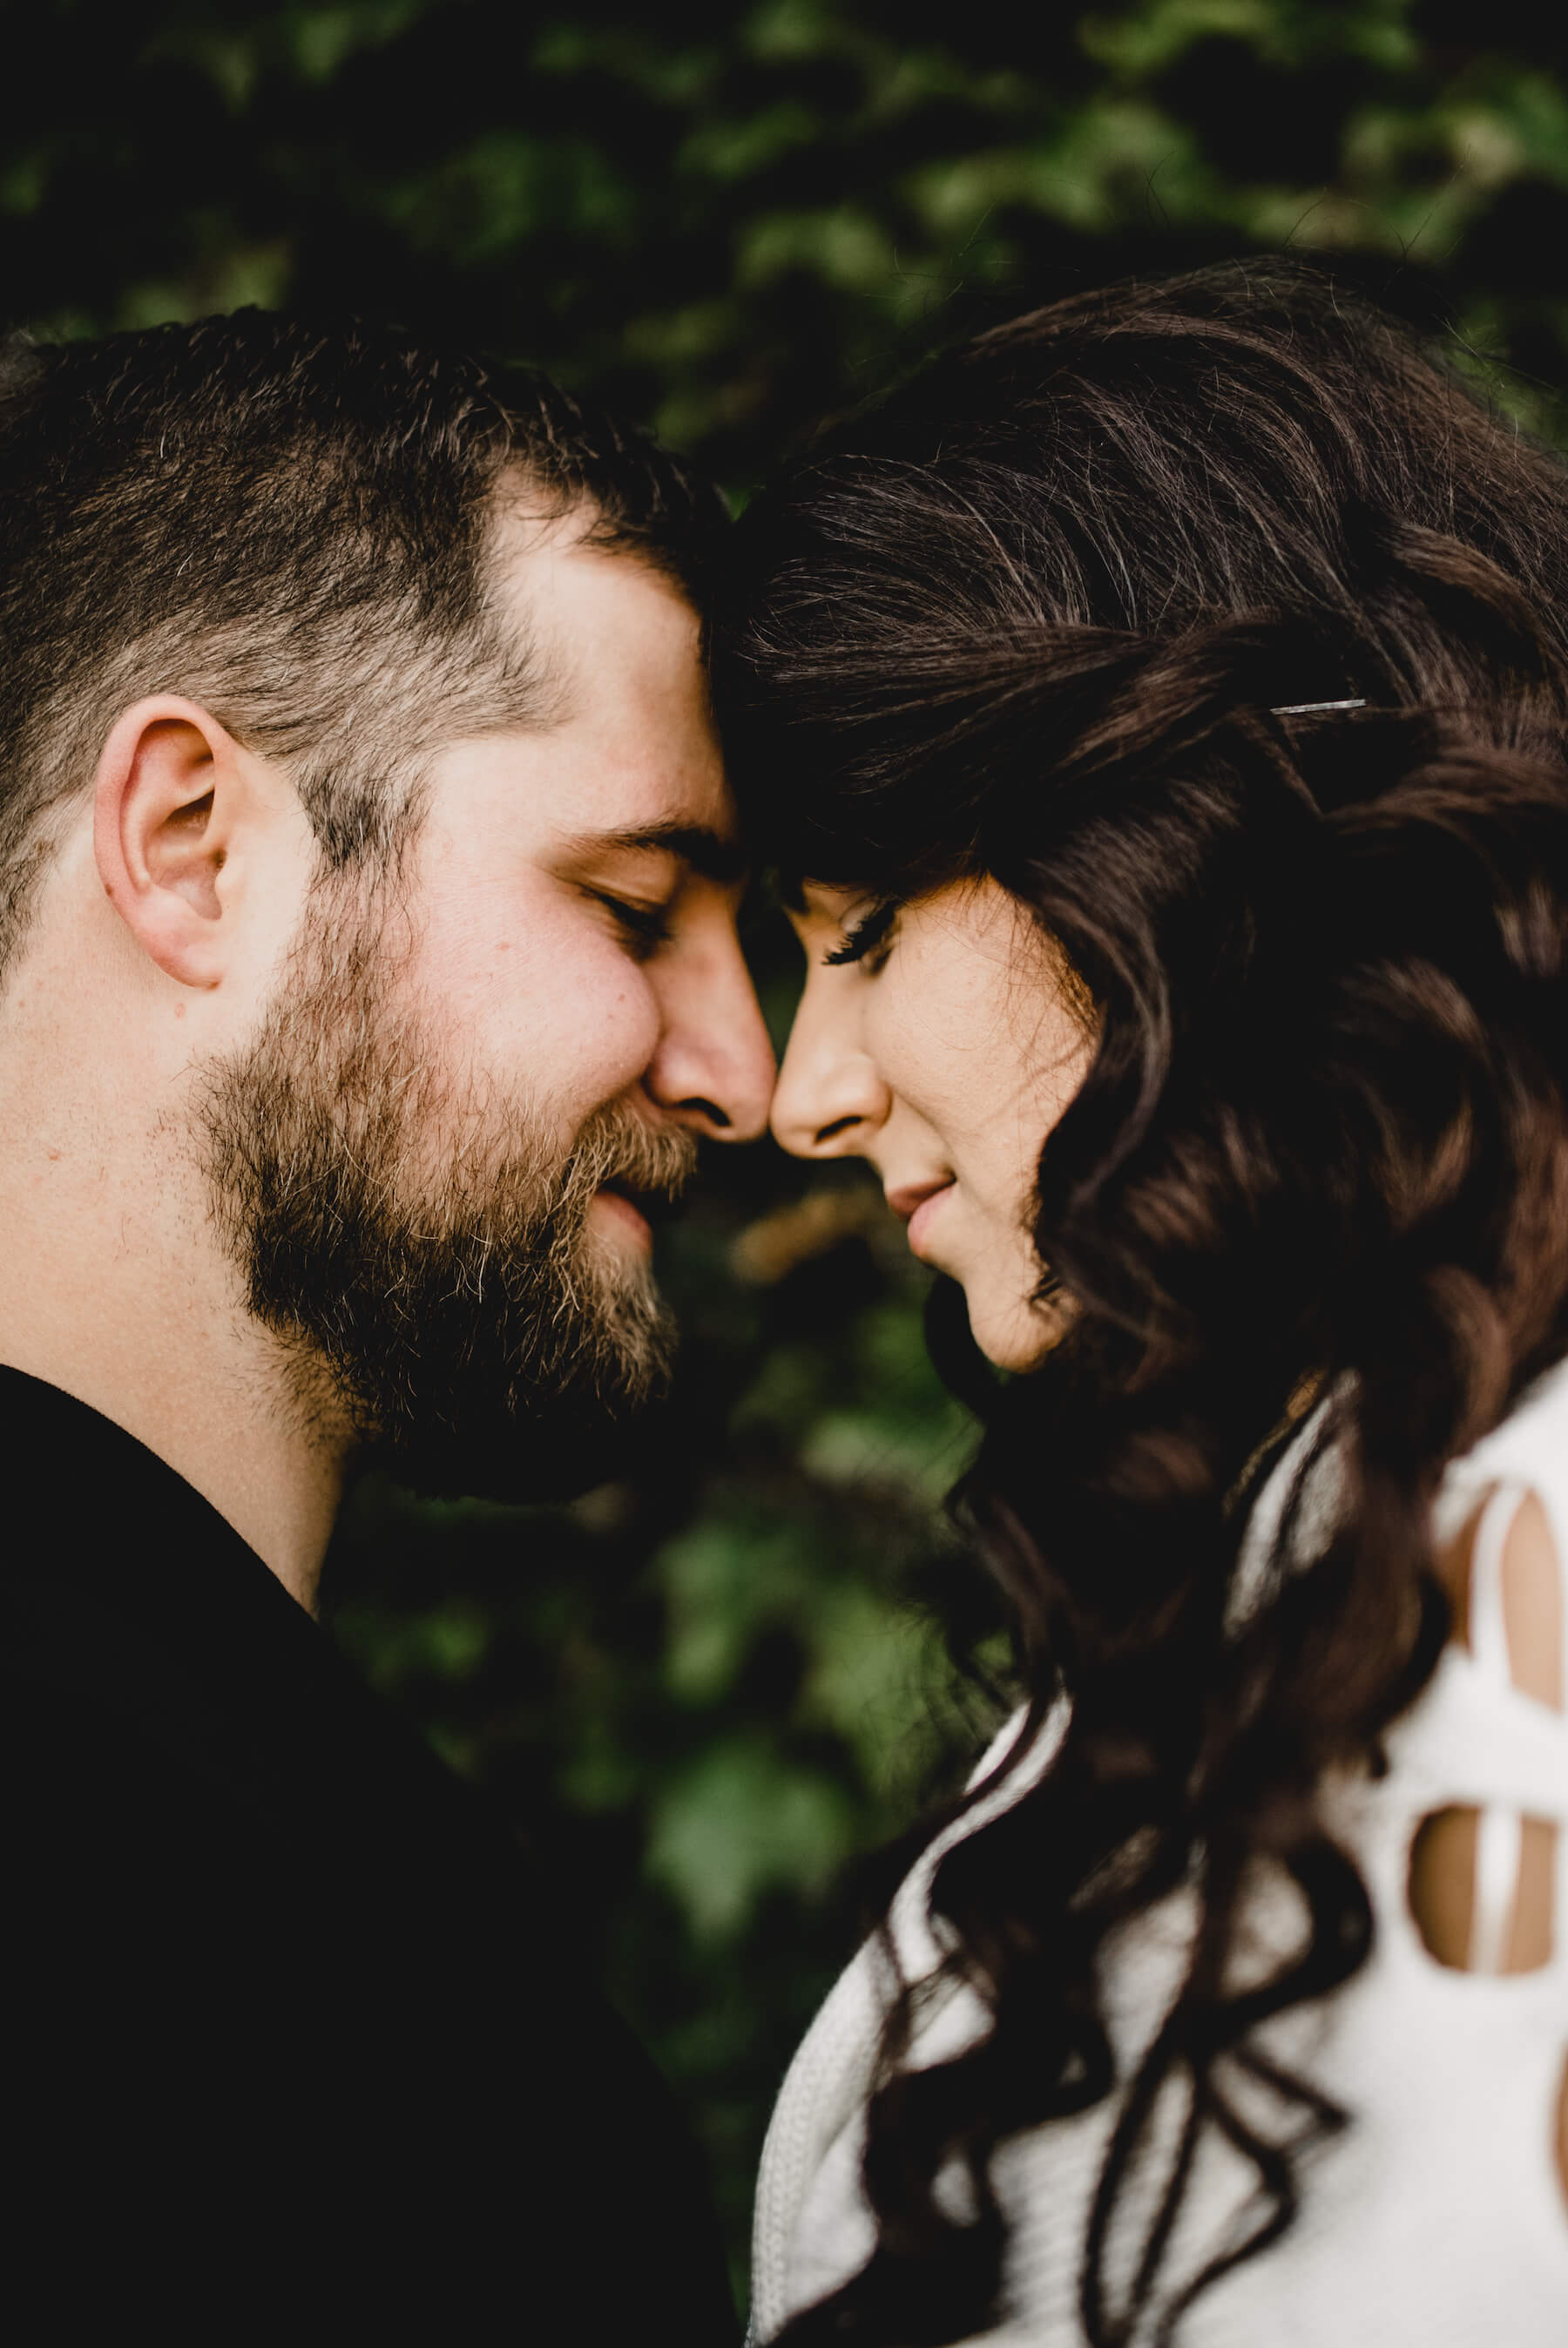 Engle-Olson-Chad-Jen-Engagement-31.jpg